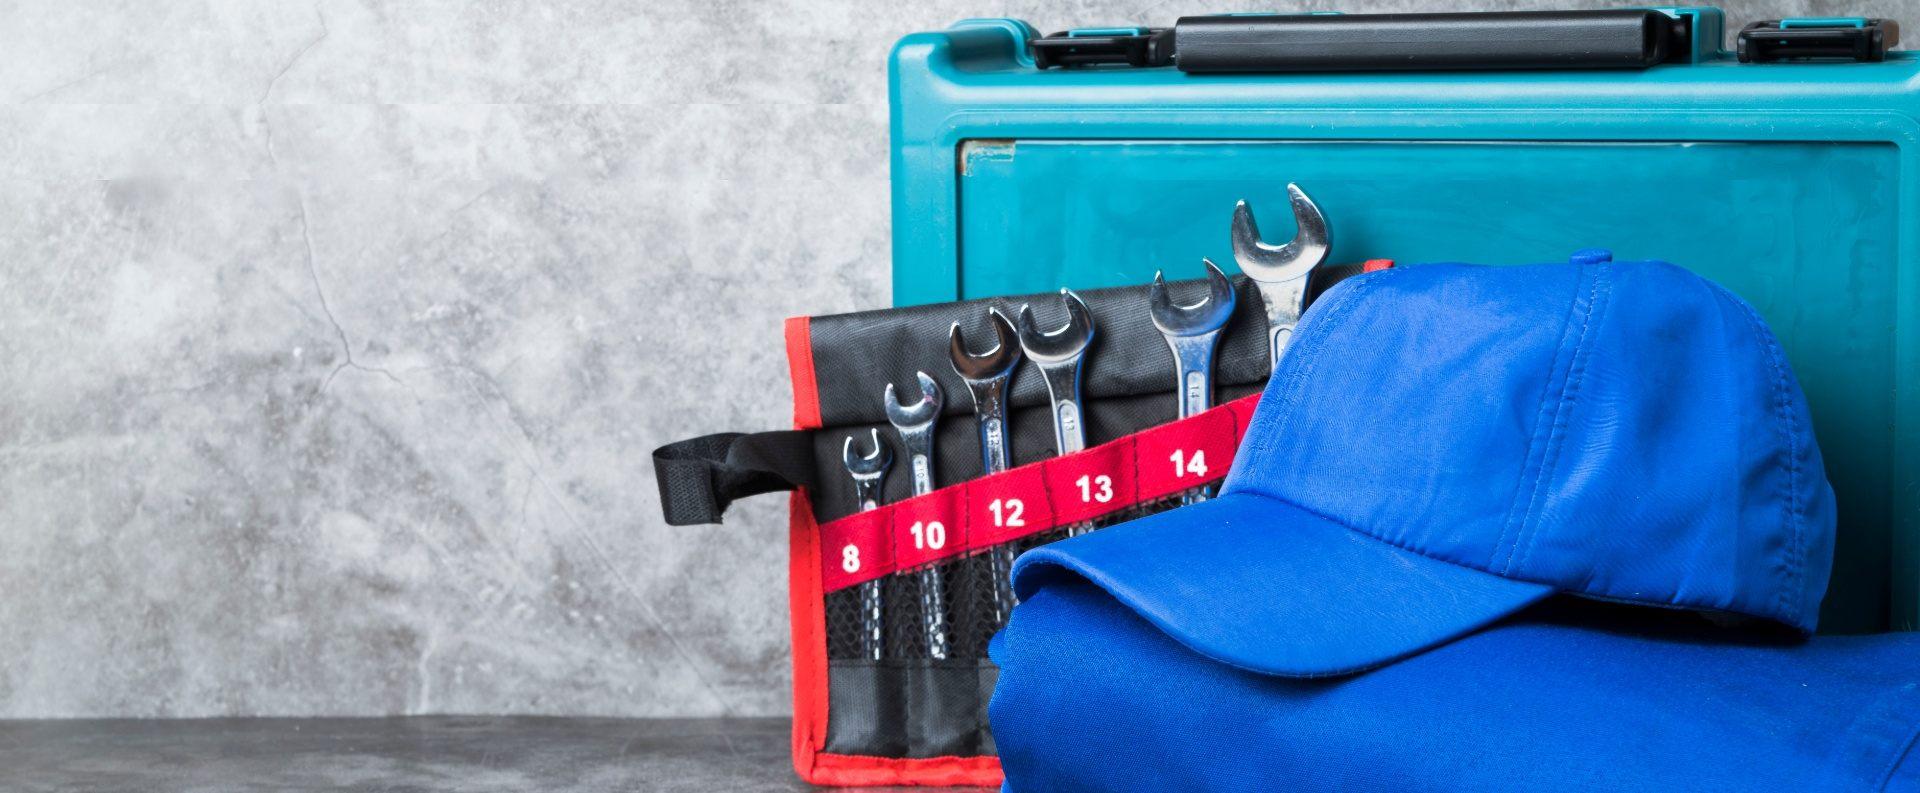 Technical & Maintenance services